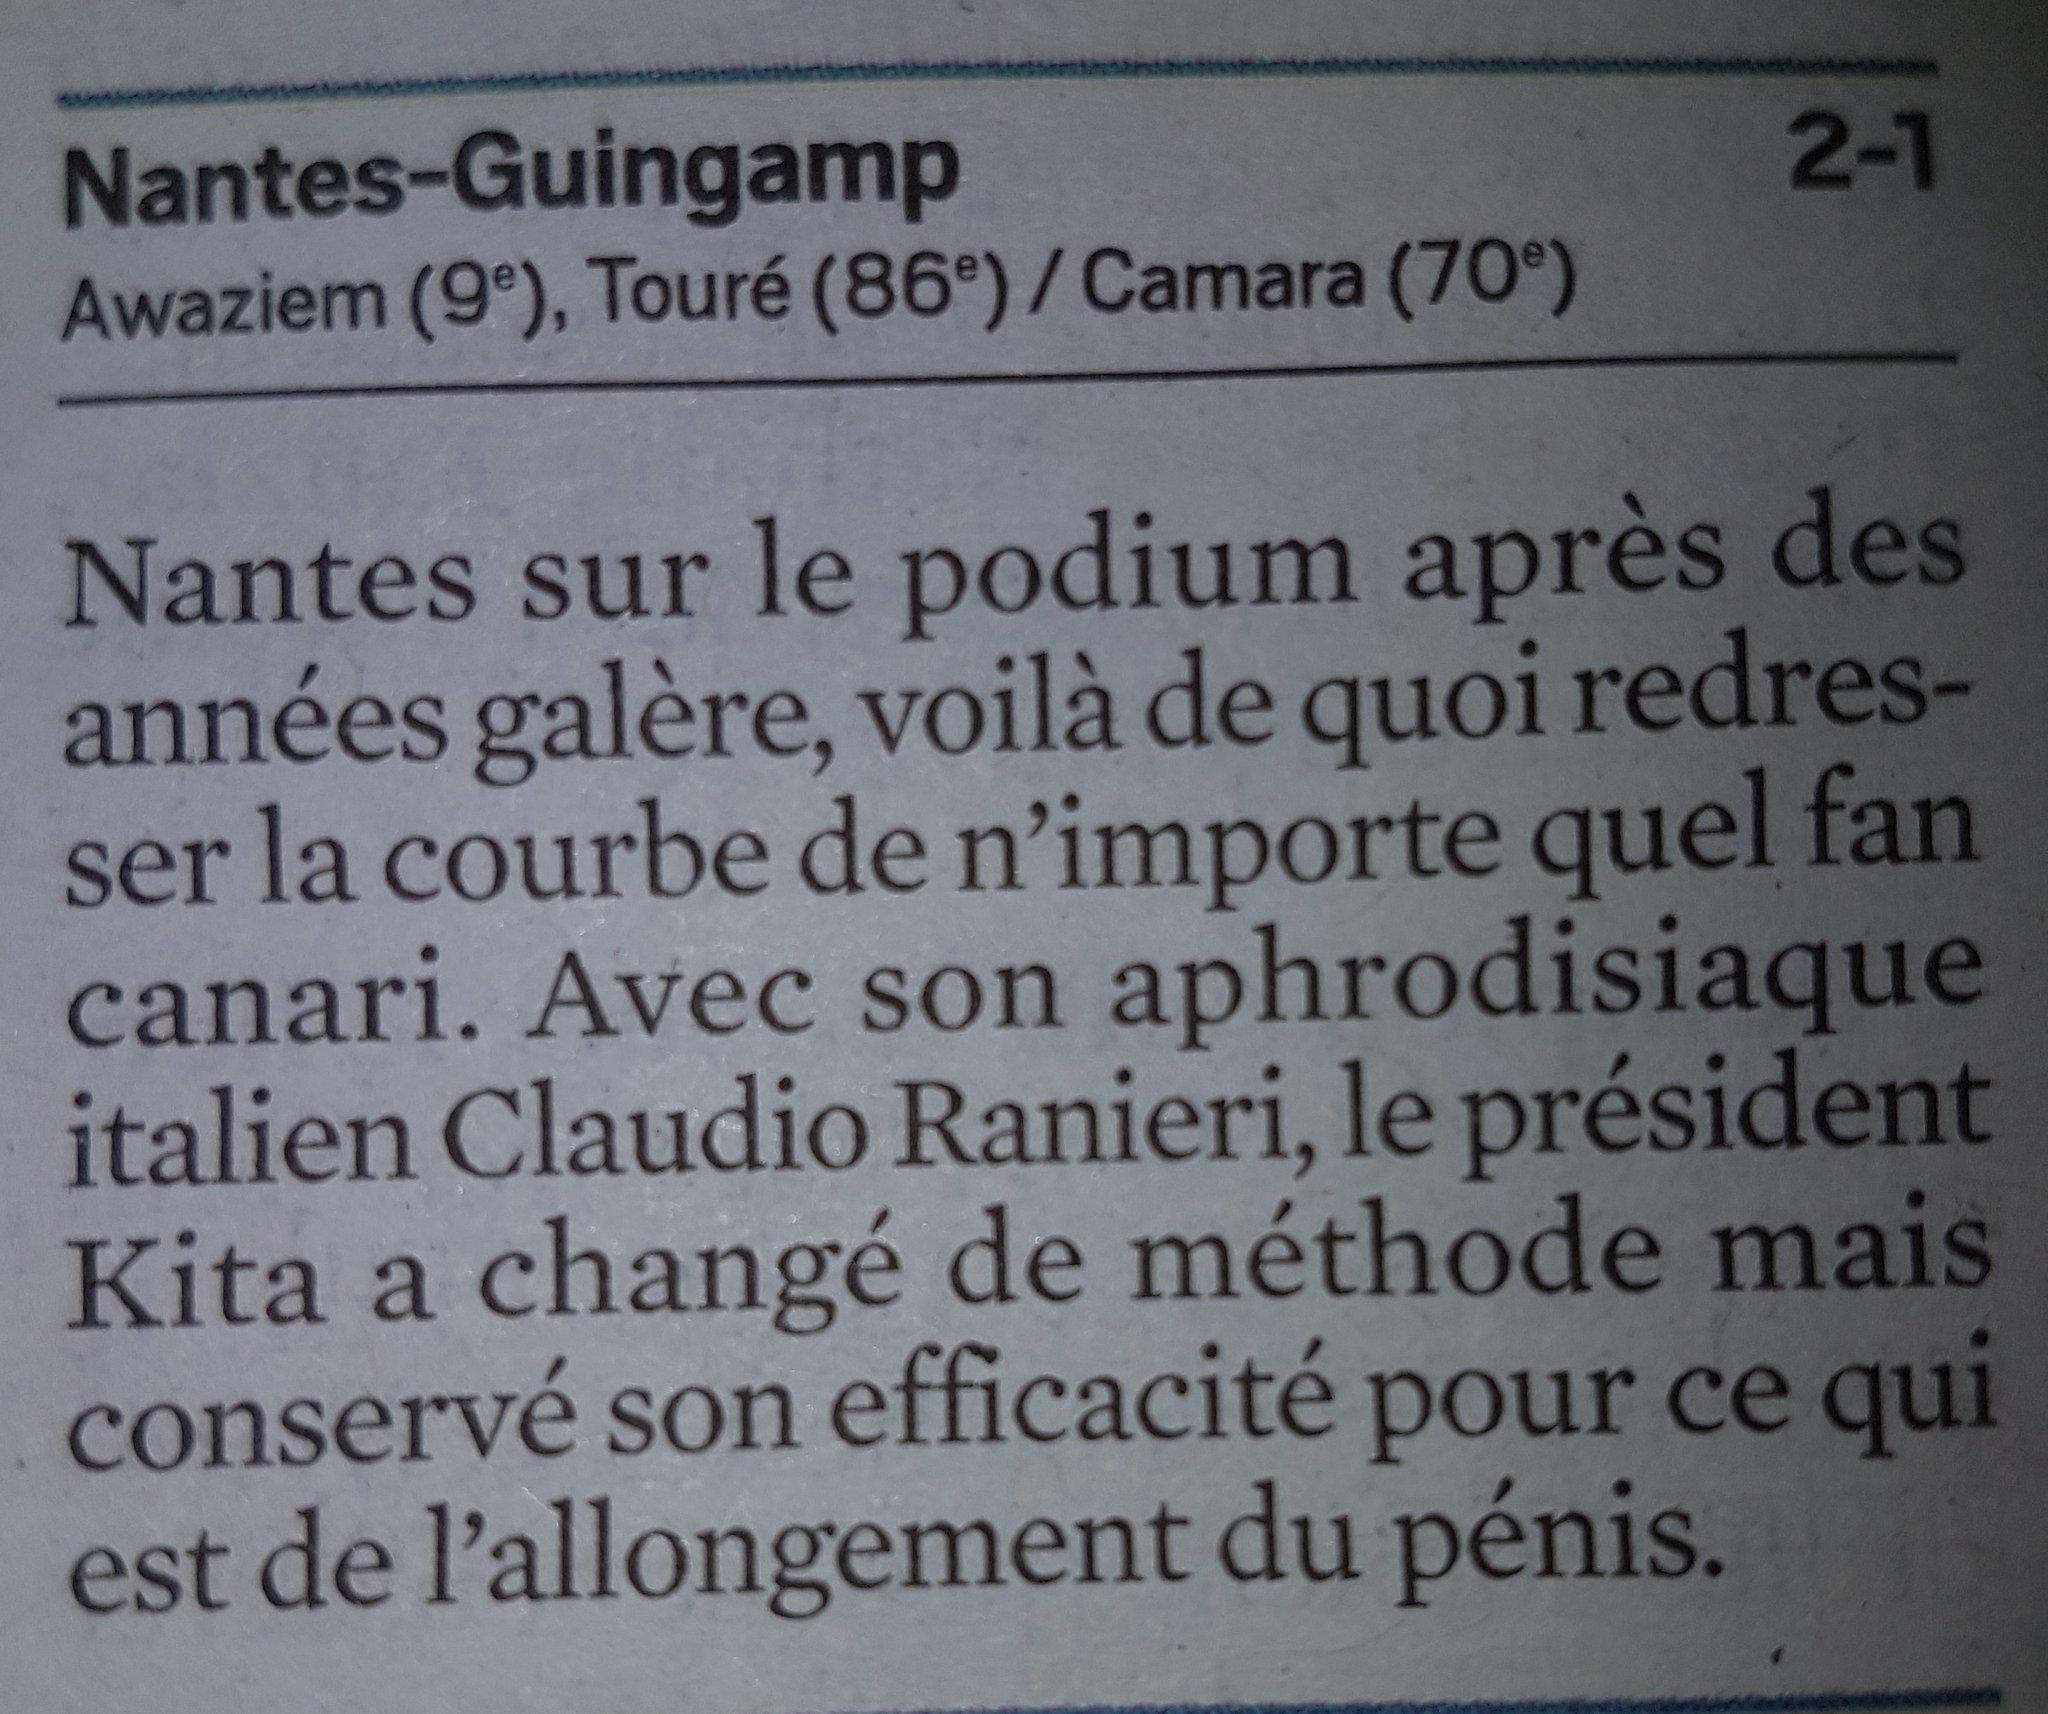 Ligue 1 2017/2018 - Page 3 DMudMRiWsAAXIlW